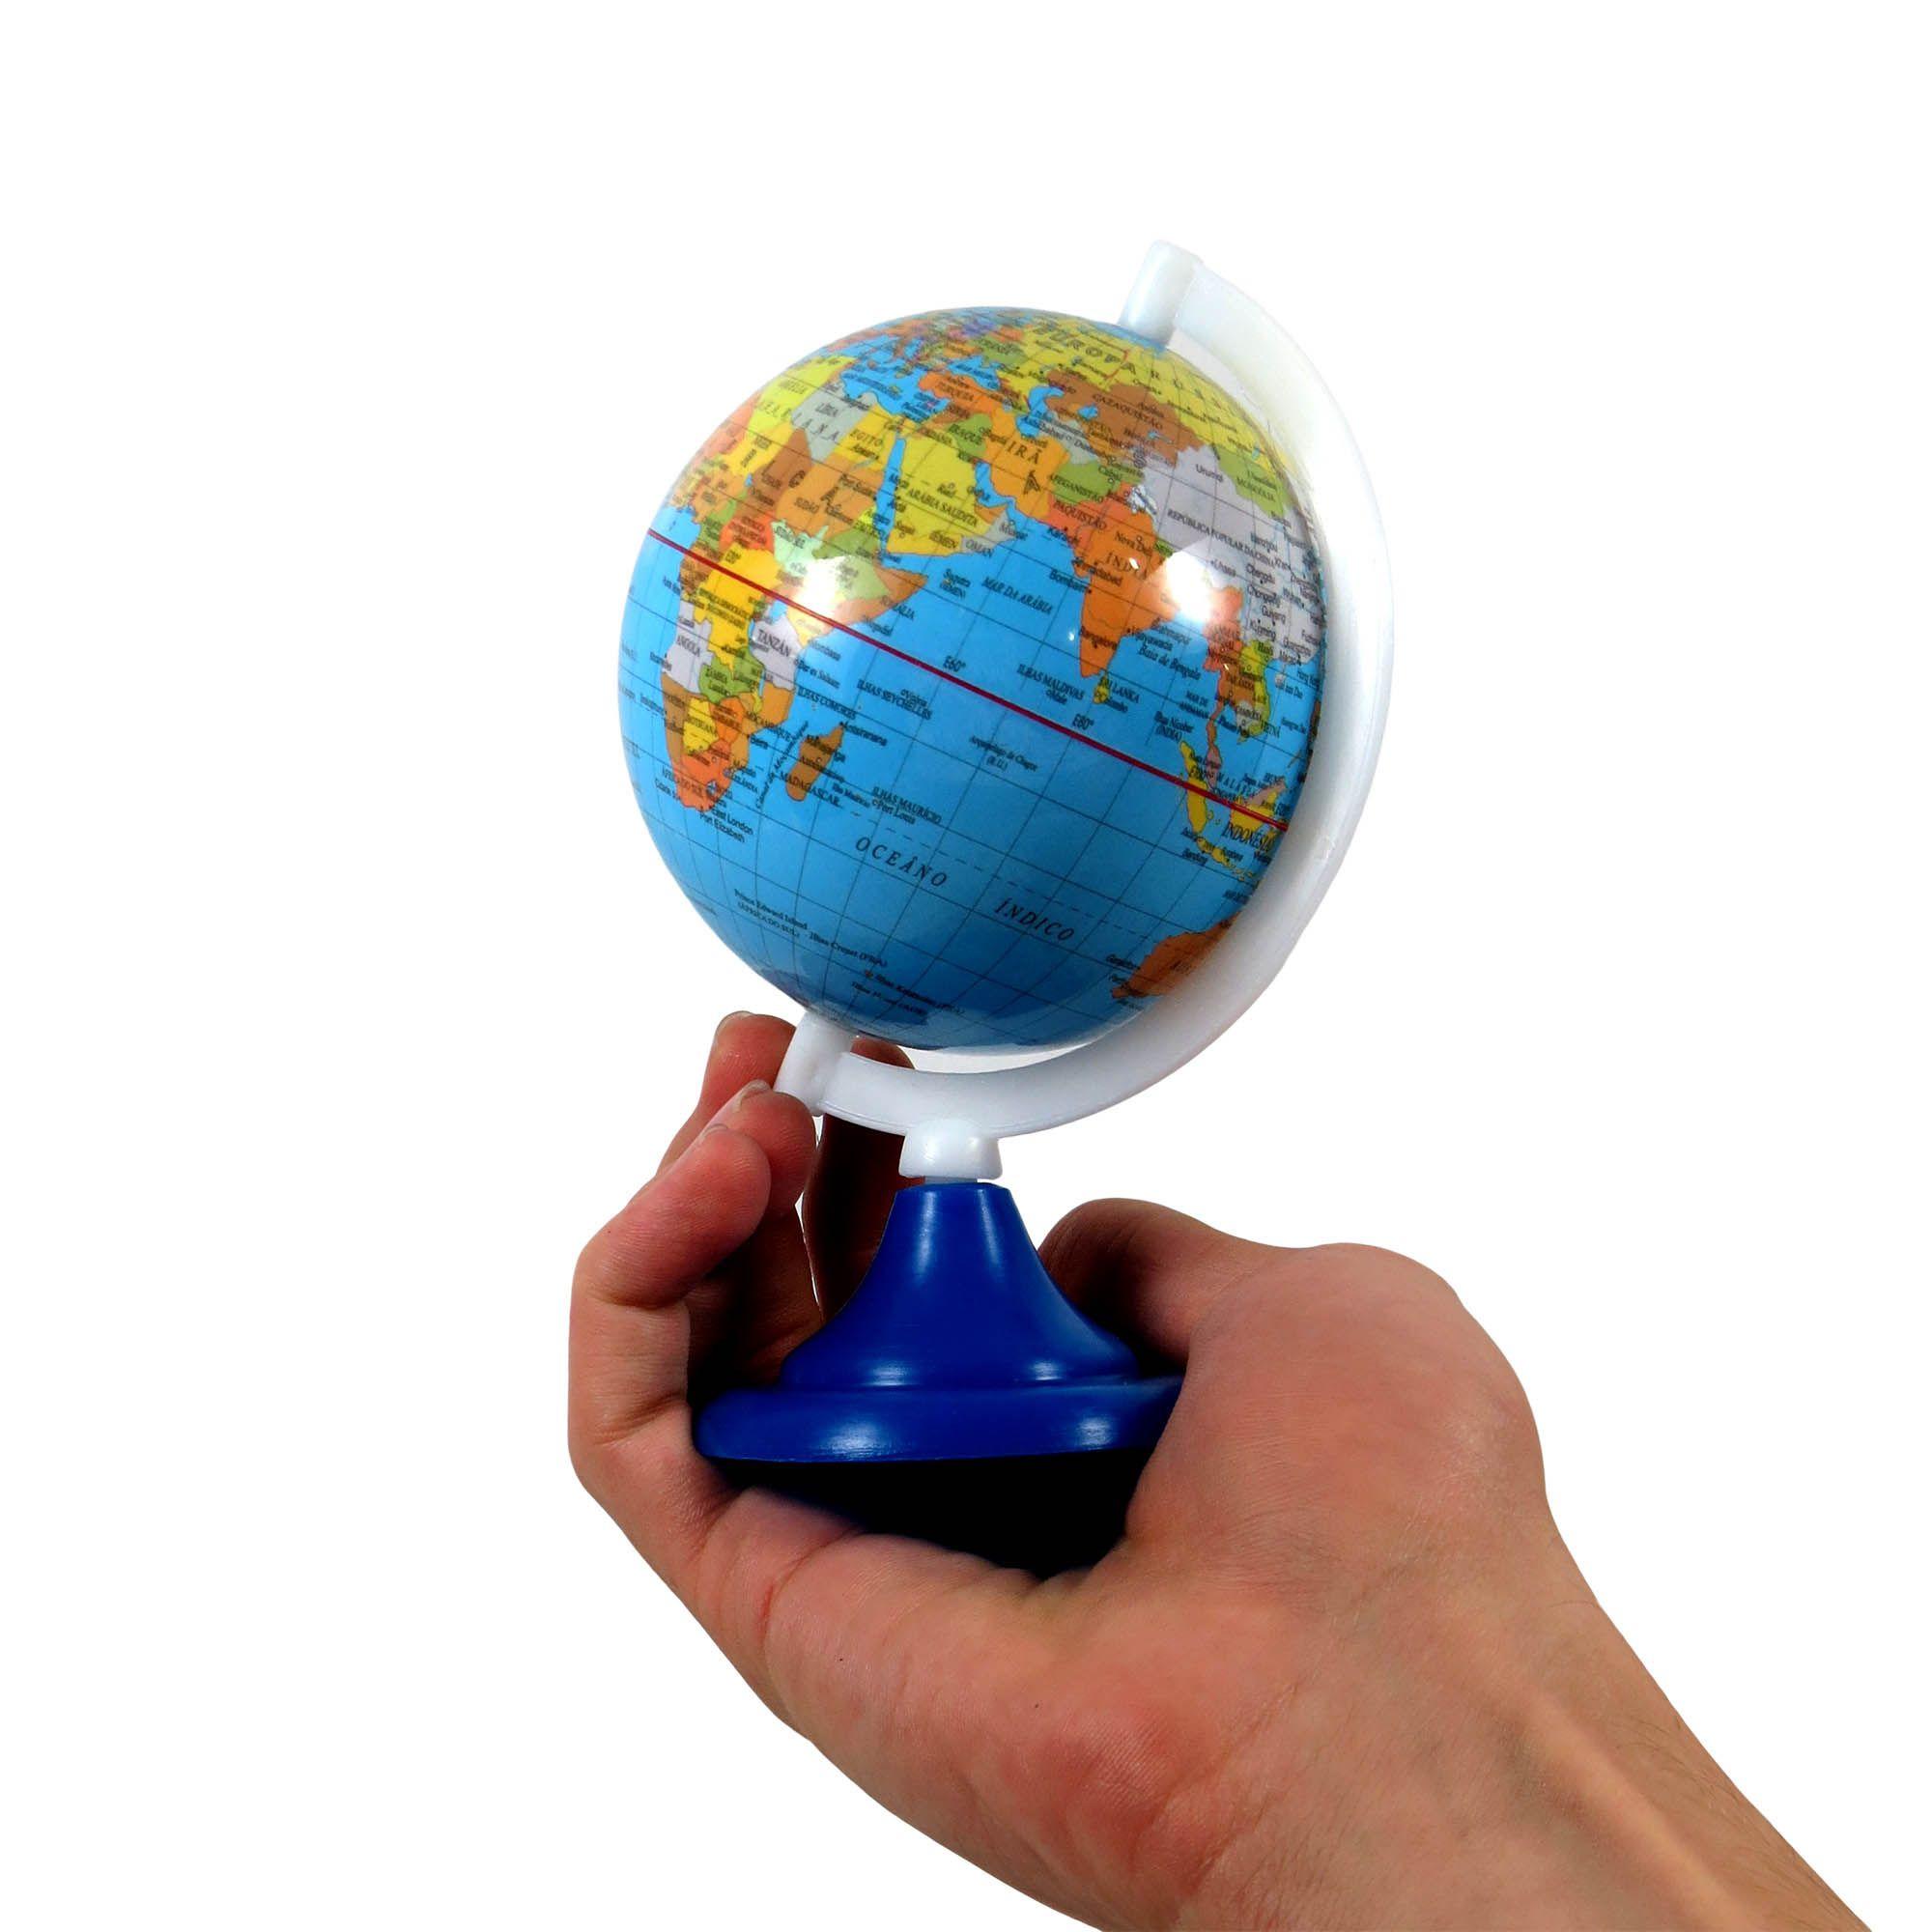 Globo Terrestre Político Mapa Decorativo Escolar Geografia